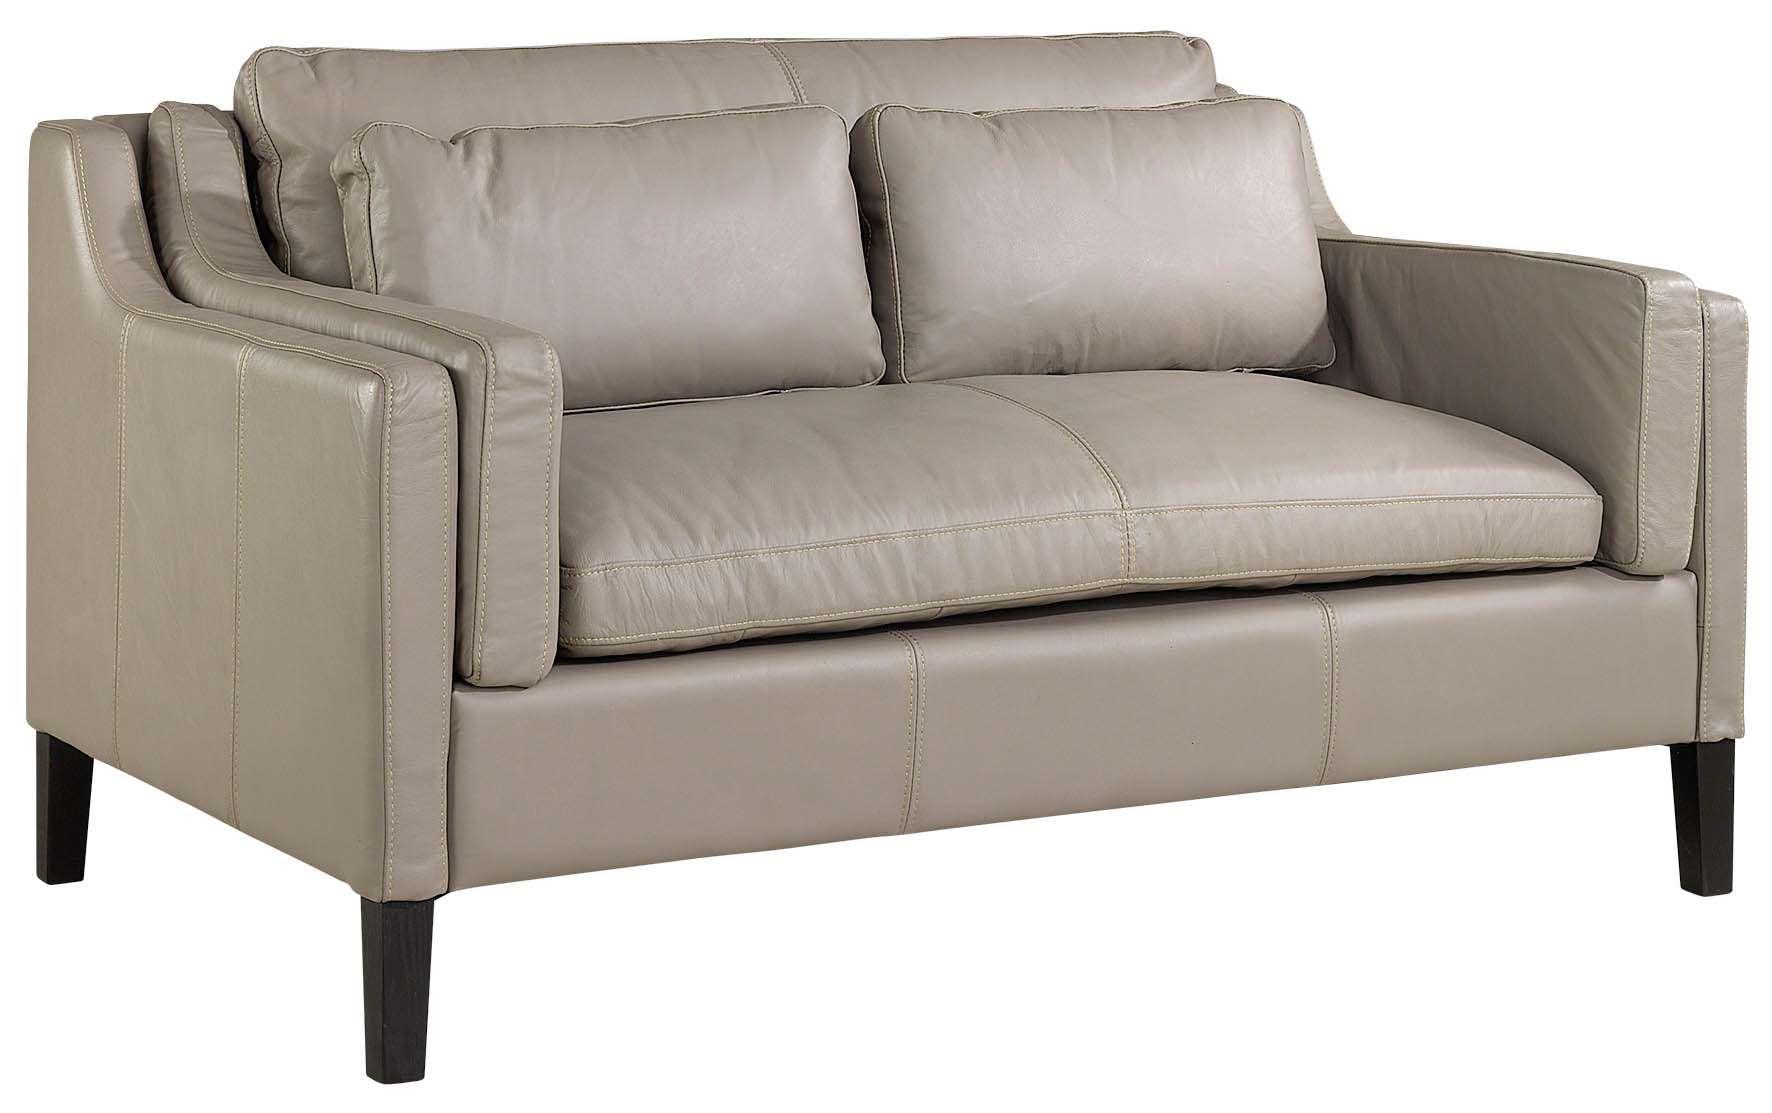 Dekoria Sofa Manchester 2-osobowa skórzana jasna